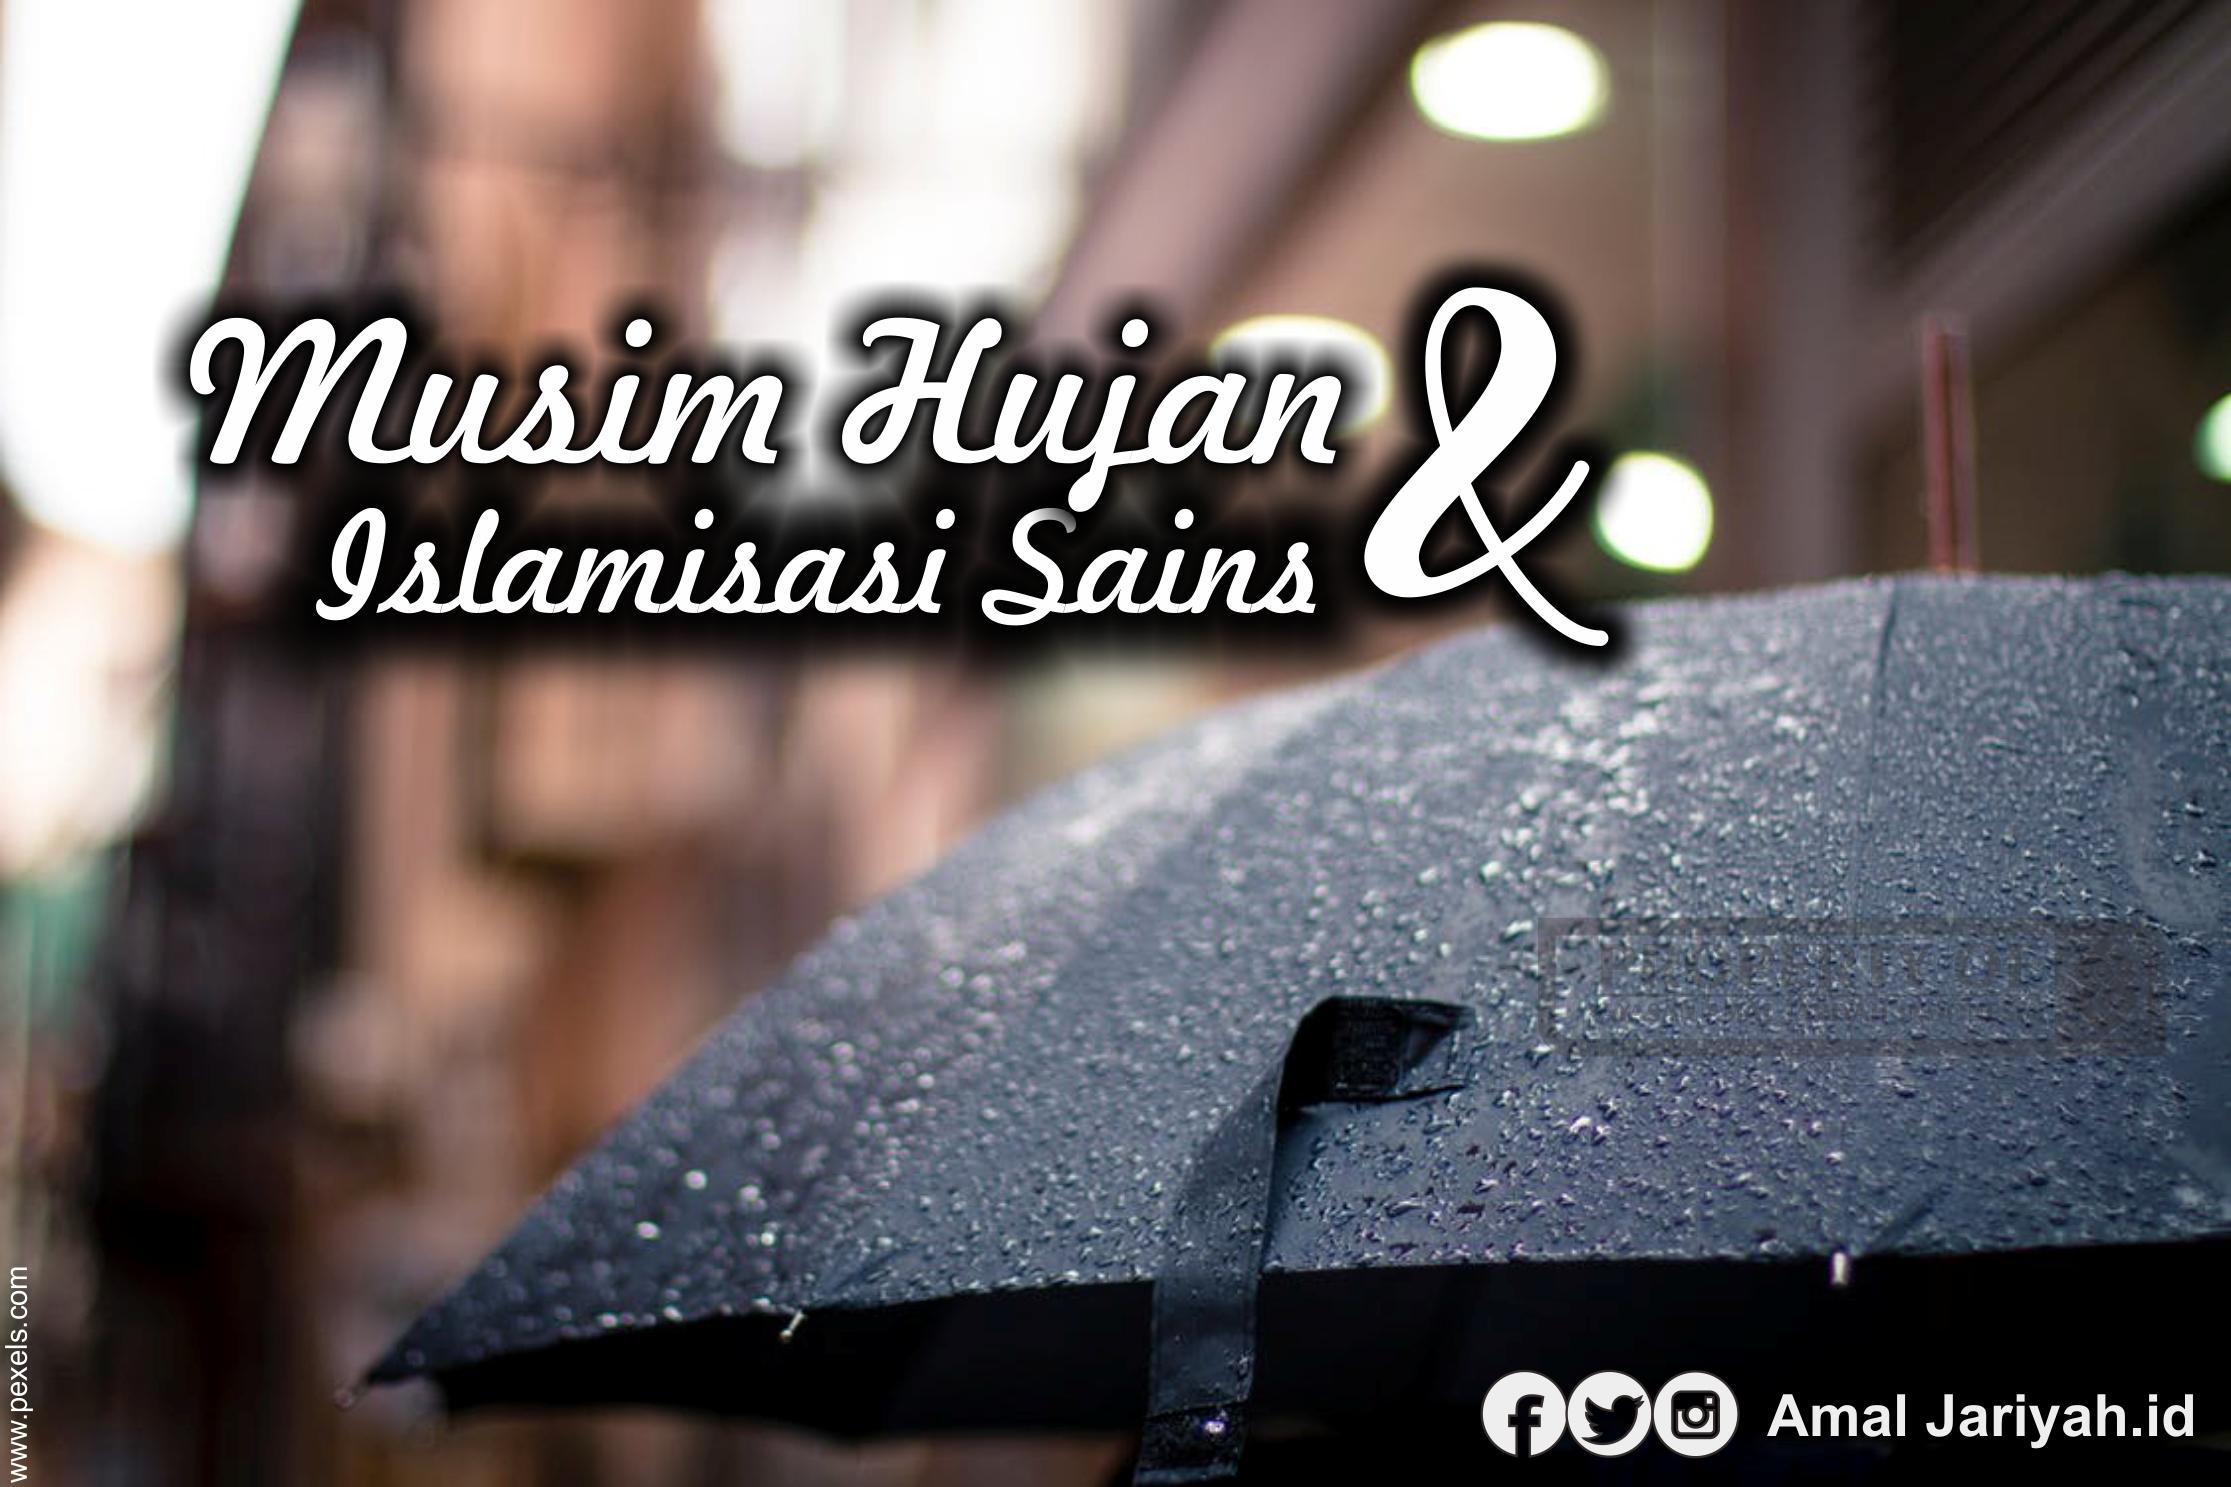 Musim Hujan dan Islamisasi Sains